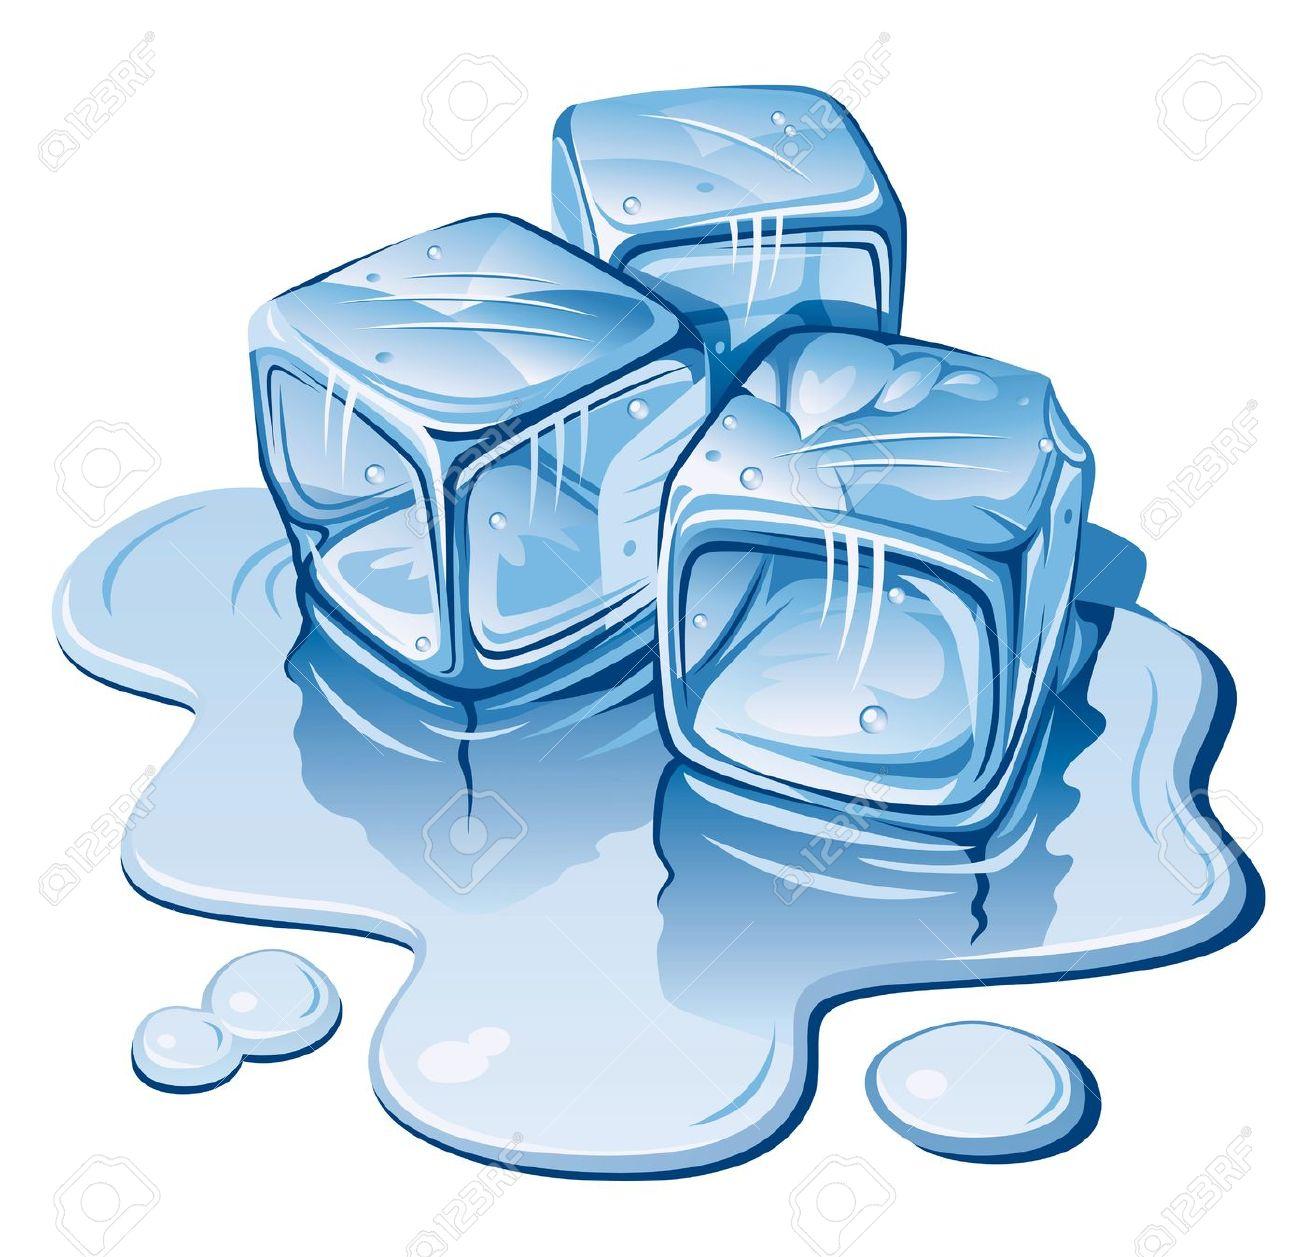 Ice clipart #5